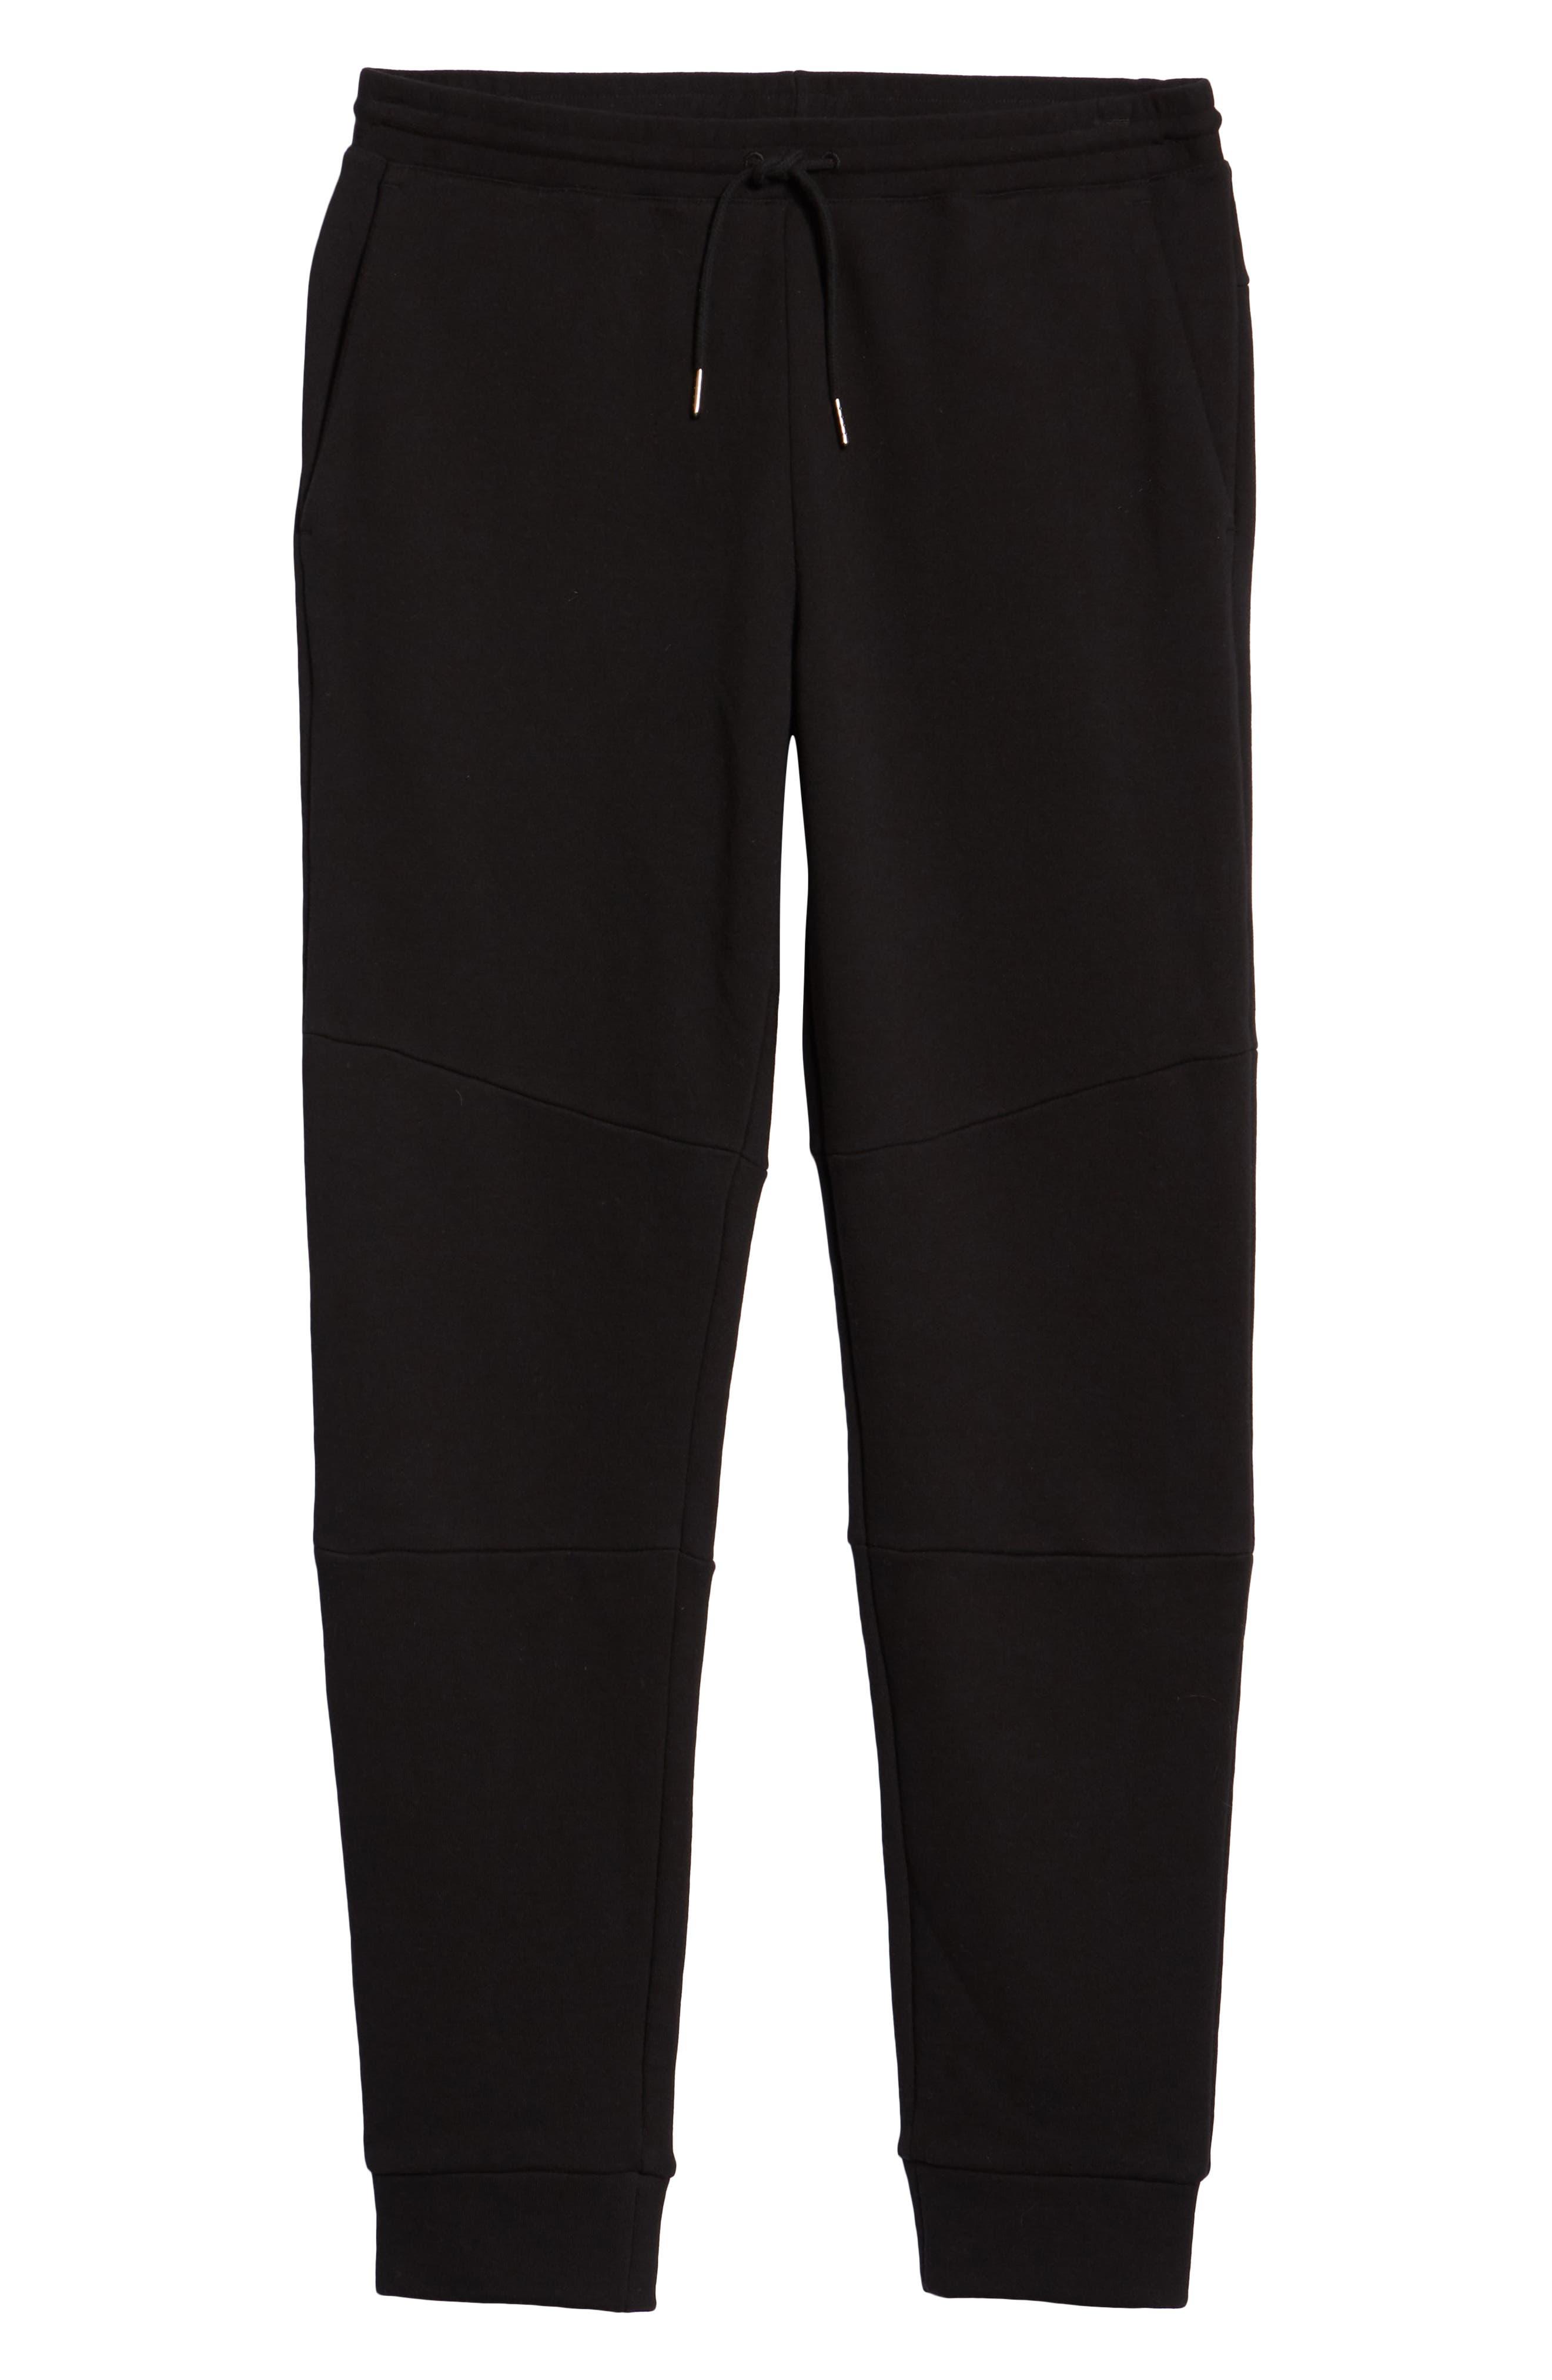 CLUB MONACO,                             Articulated Seam Jogger Pants,                             Alternate thumbnail 6, color,                             001